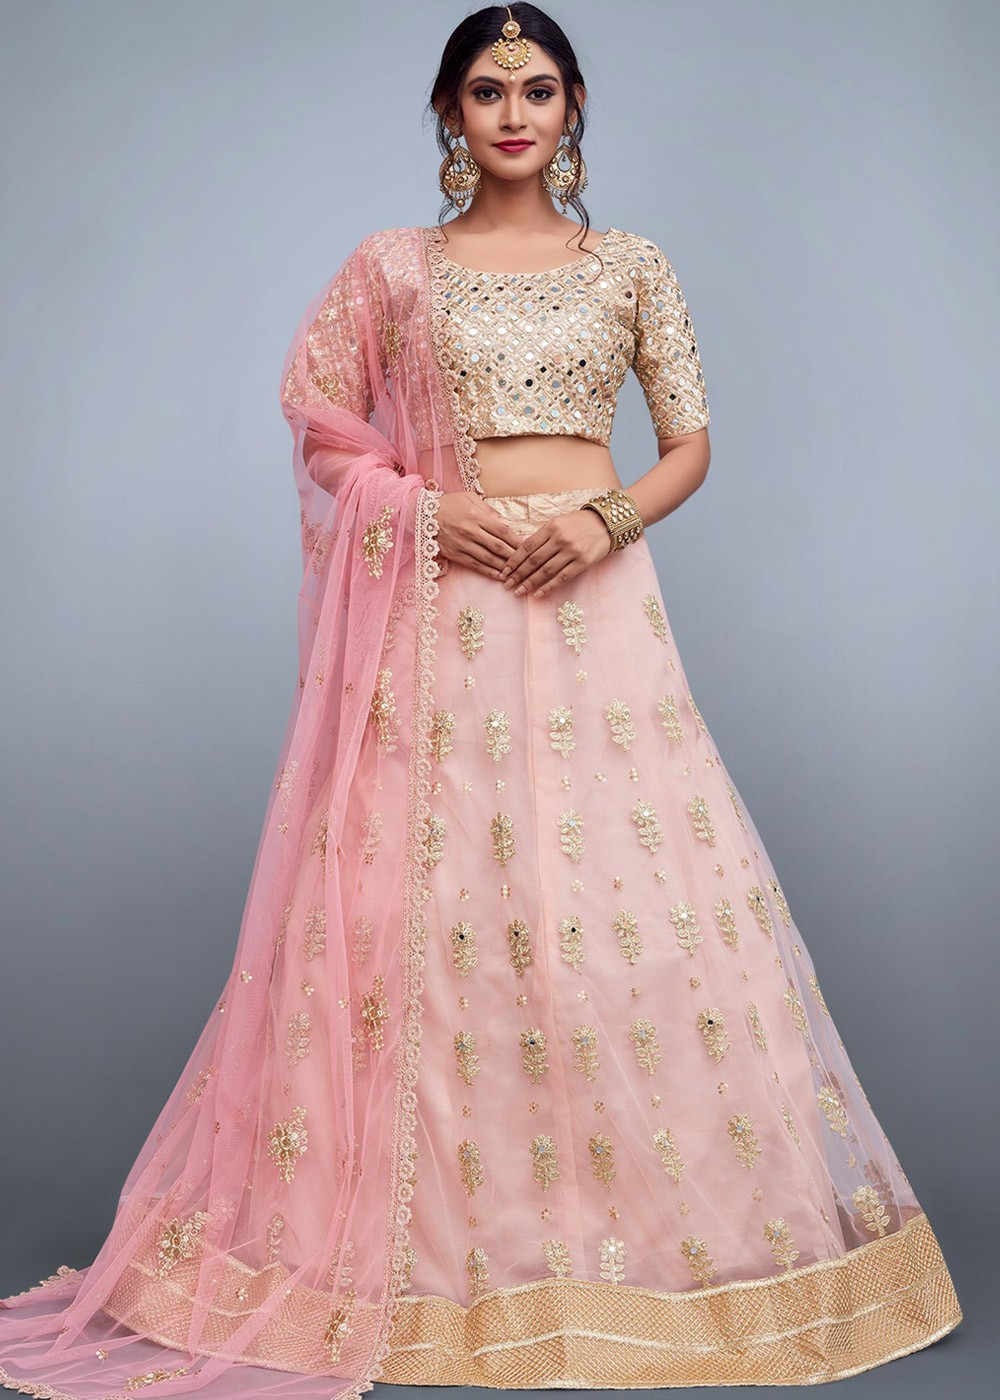 3a88b170f1c Baby Pink Embroidered Net Lehenga Choli Lehenga 1718LG05